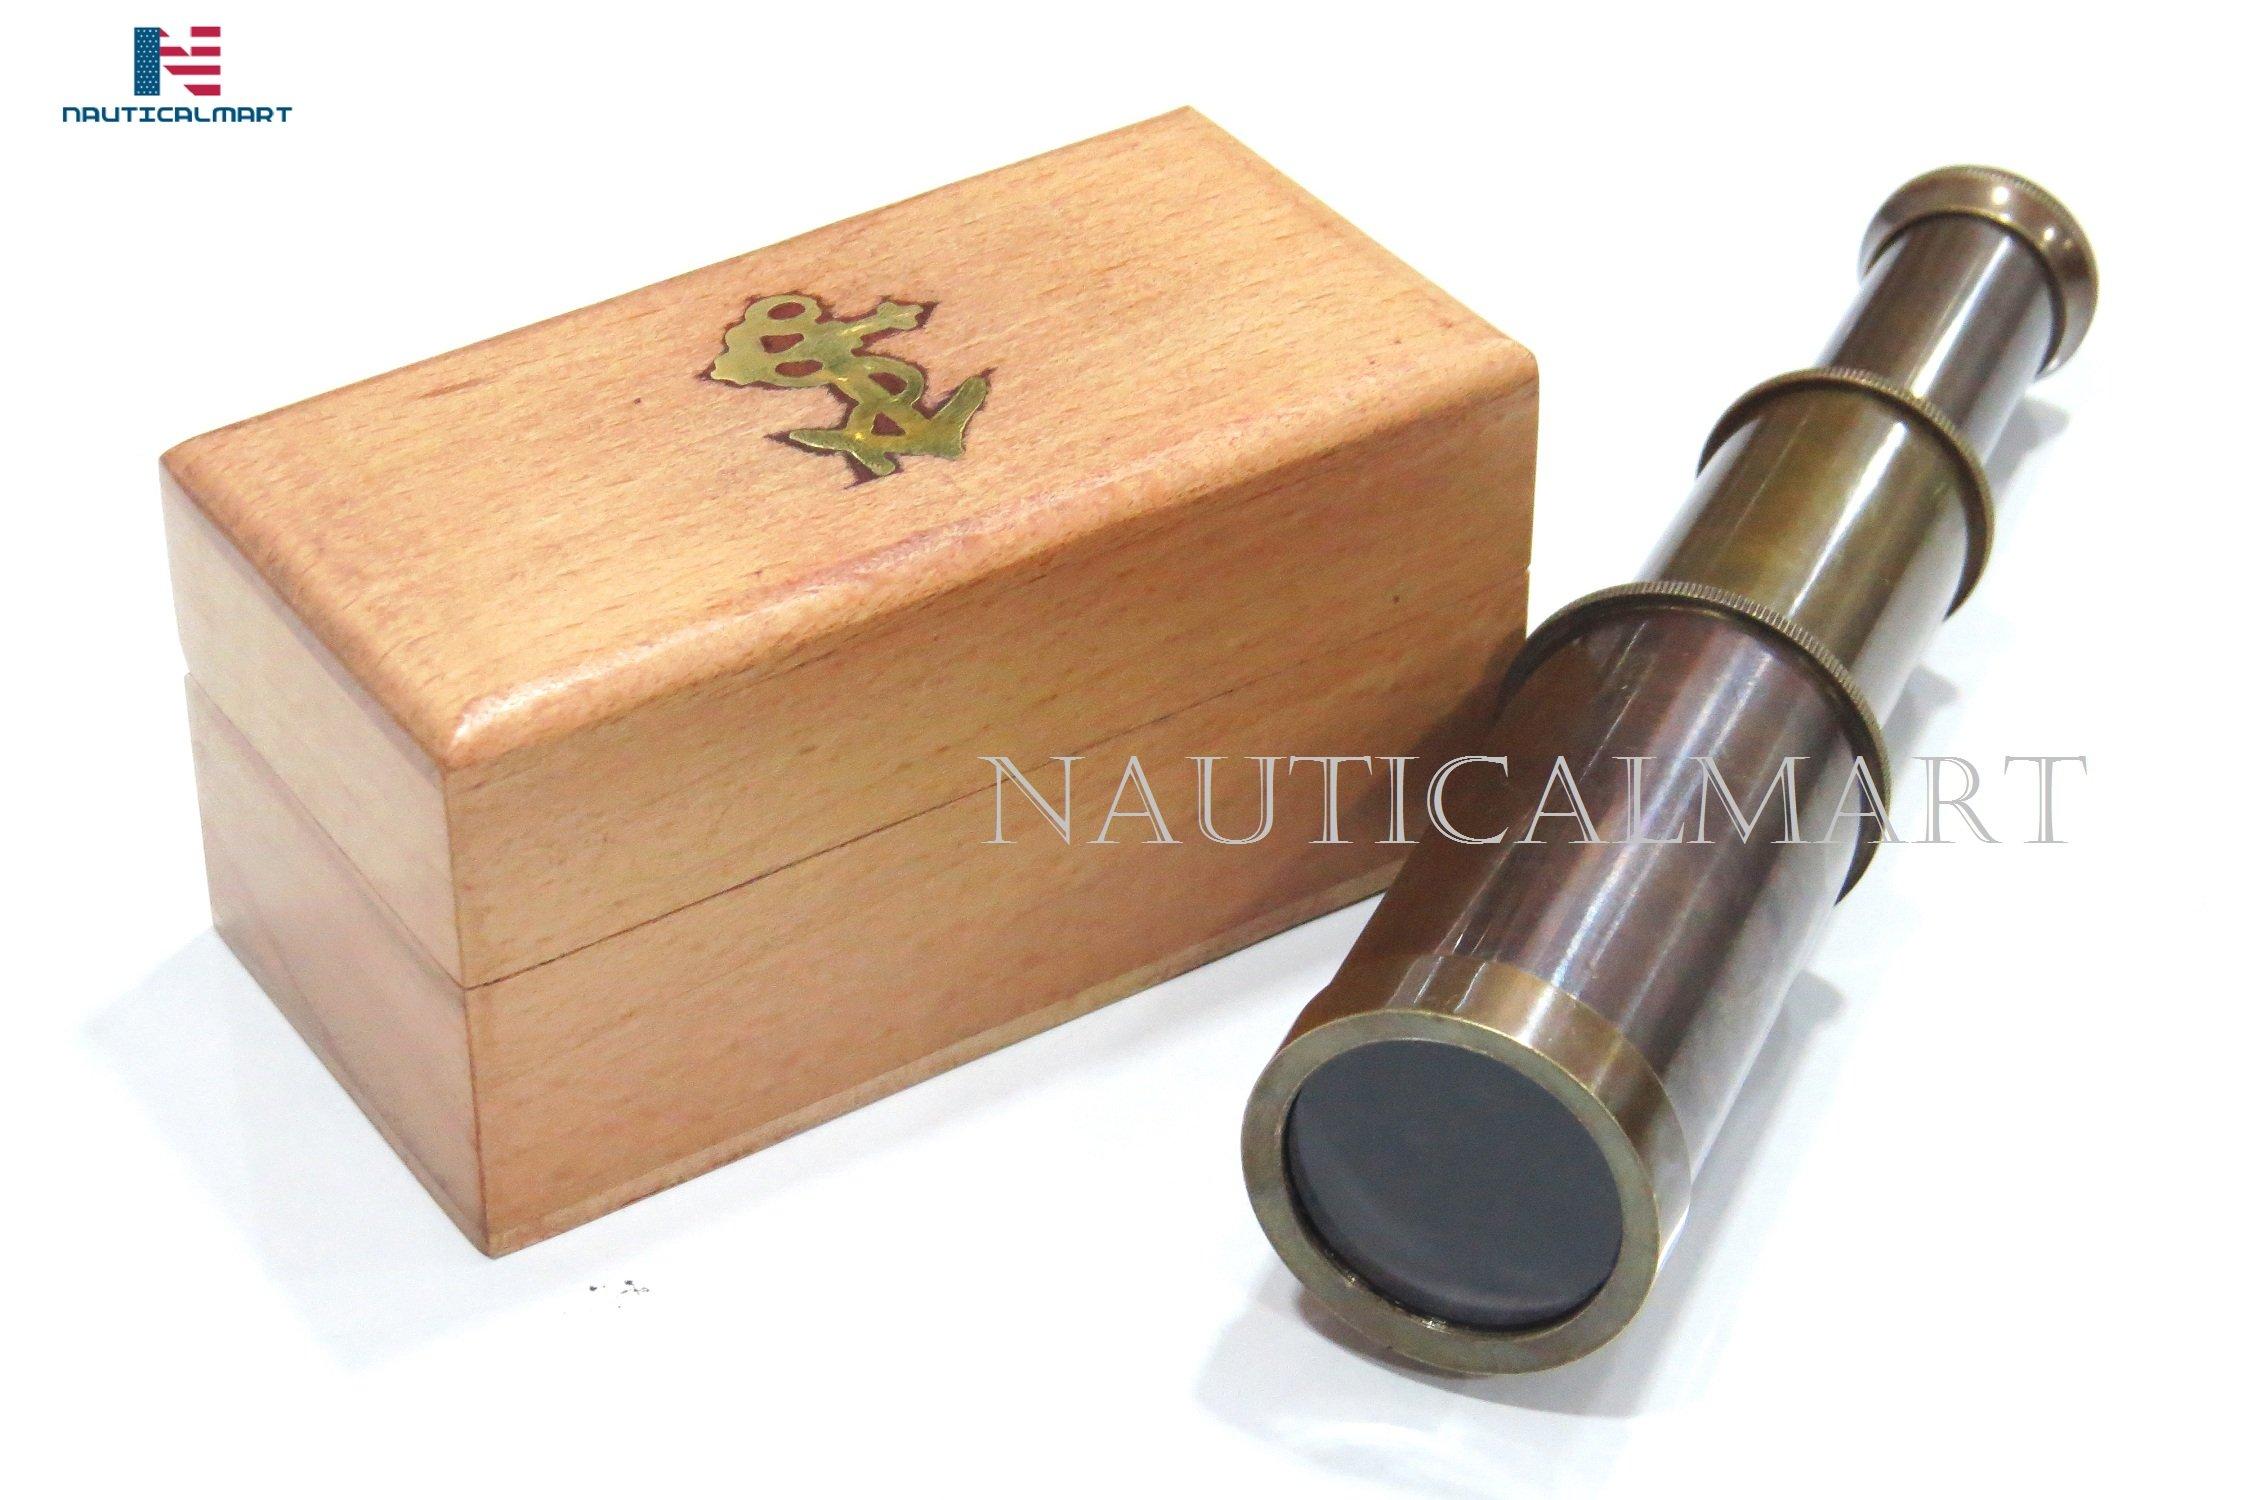 NauticalMart Spyglass Antique Brass Telescope Toy 6'' With Wooden Box